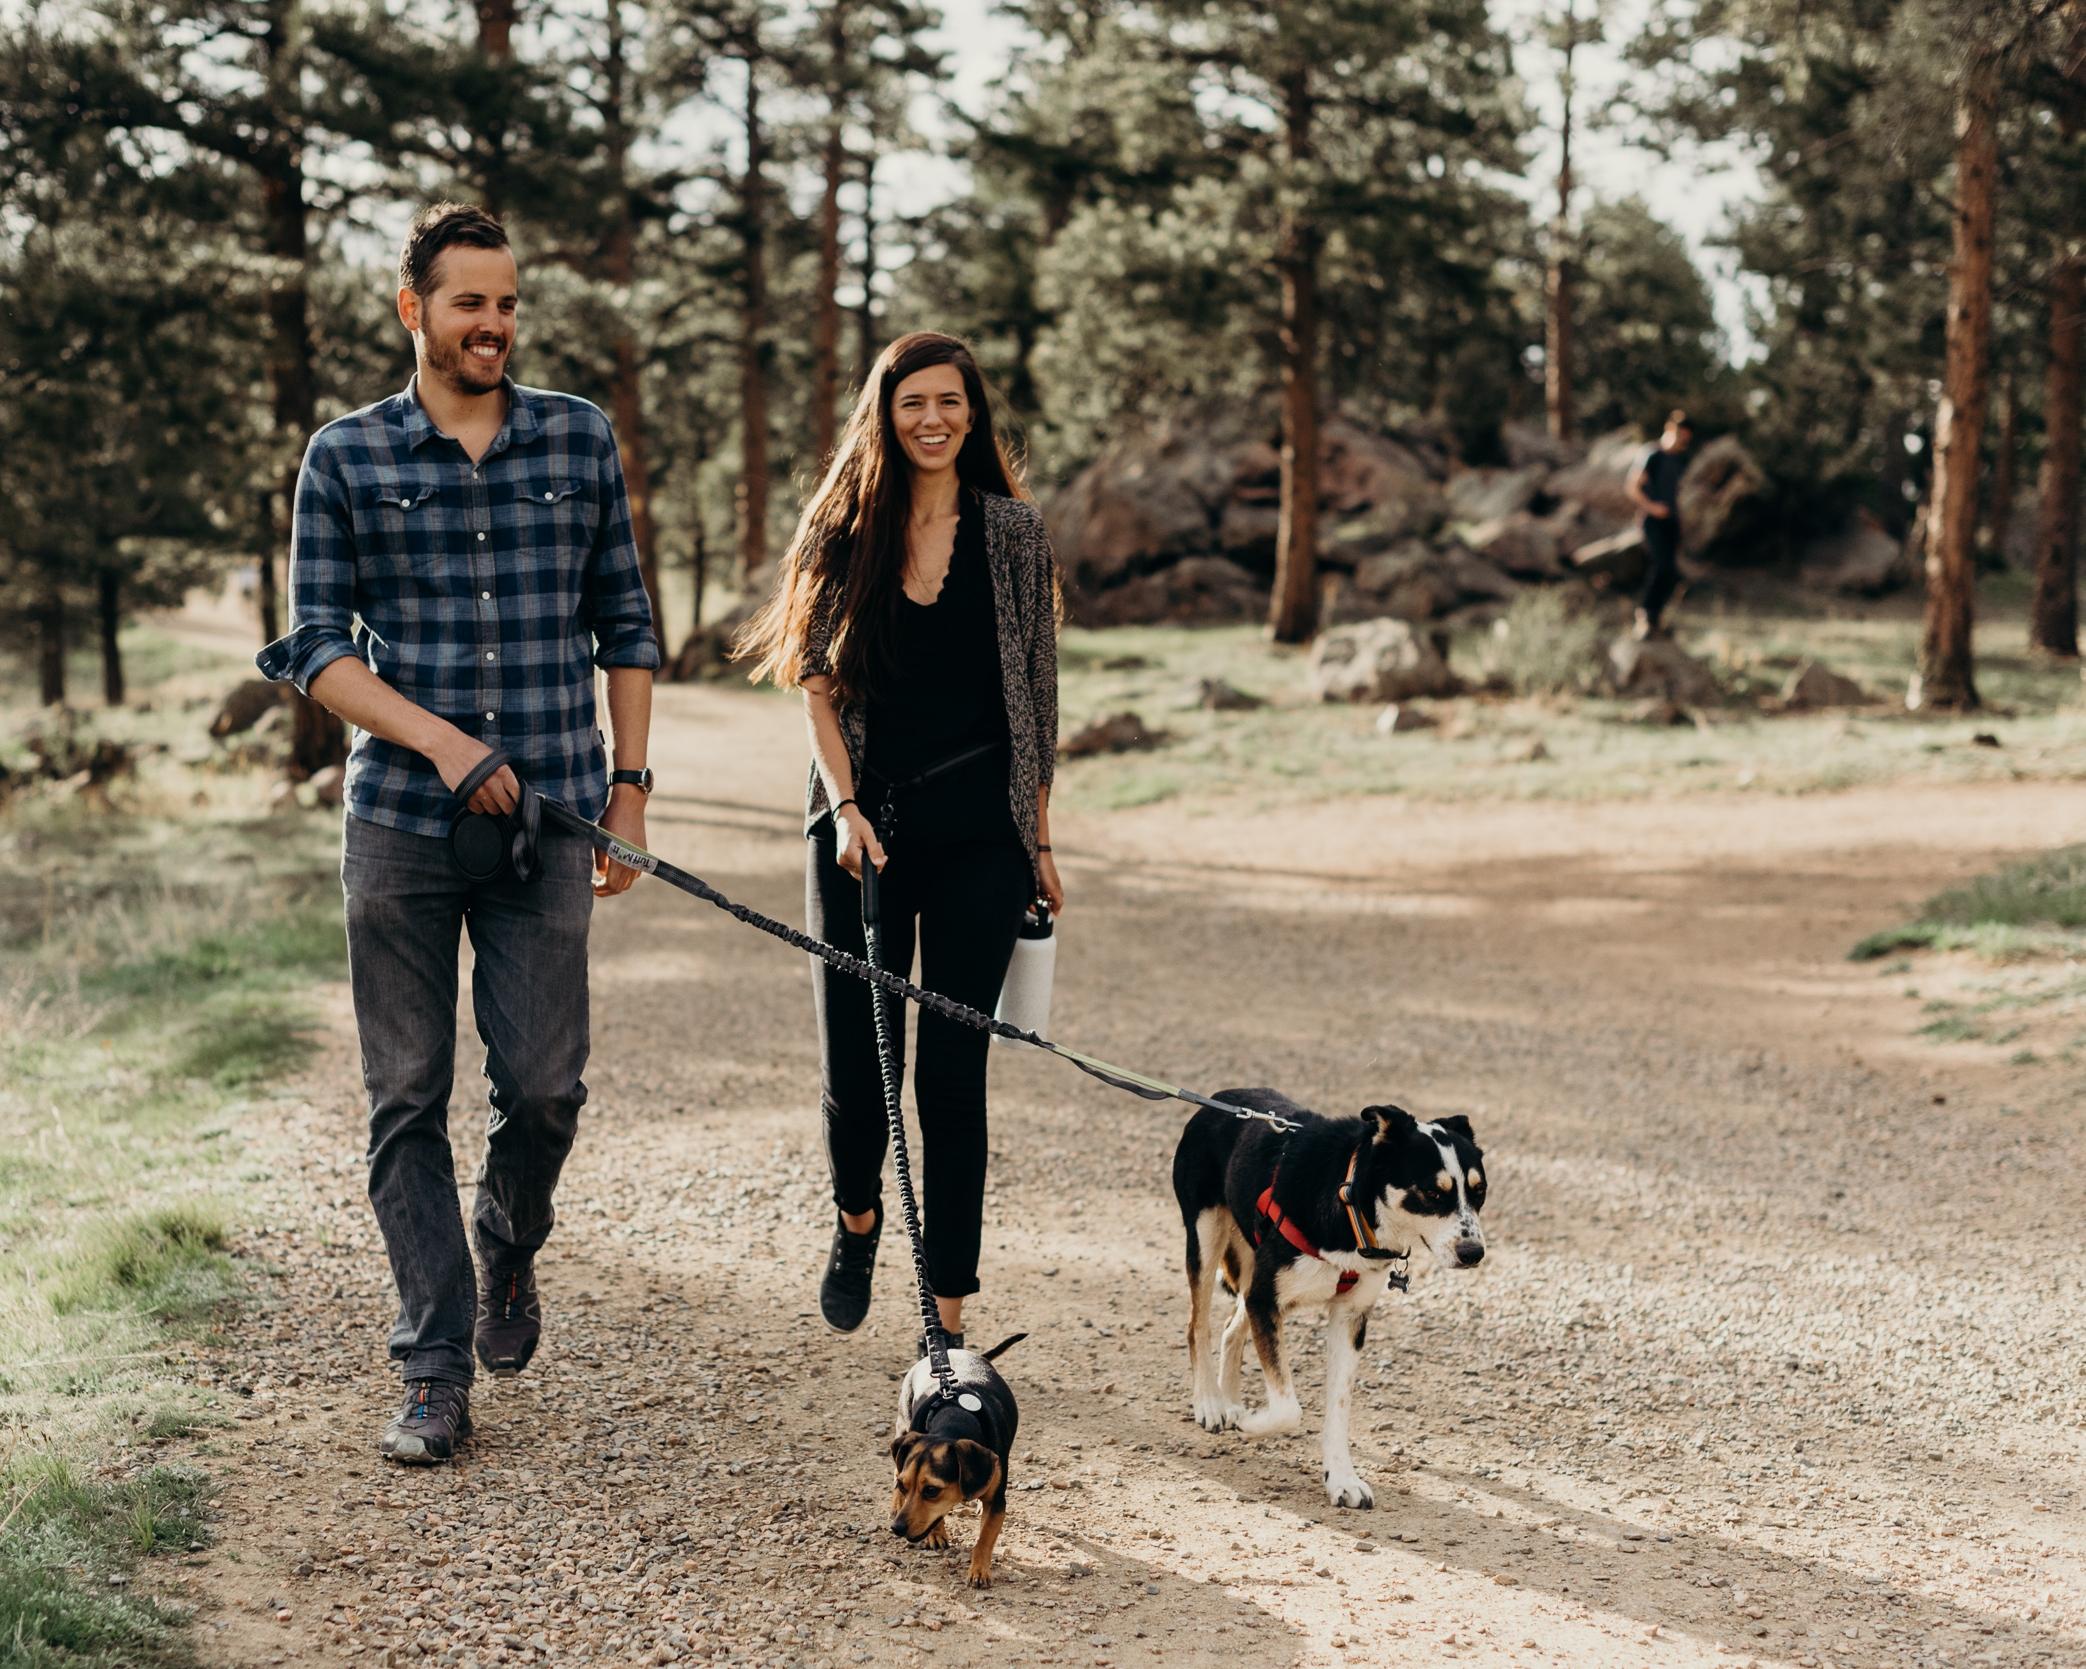 Denver-Colorado-Mt-Falcon-Engagement-Megan-Graham-Photography-6766.jpg